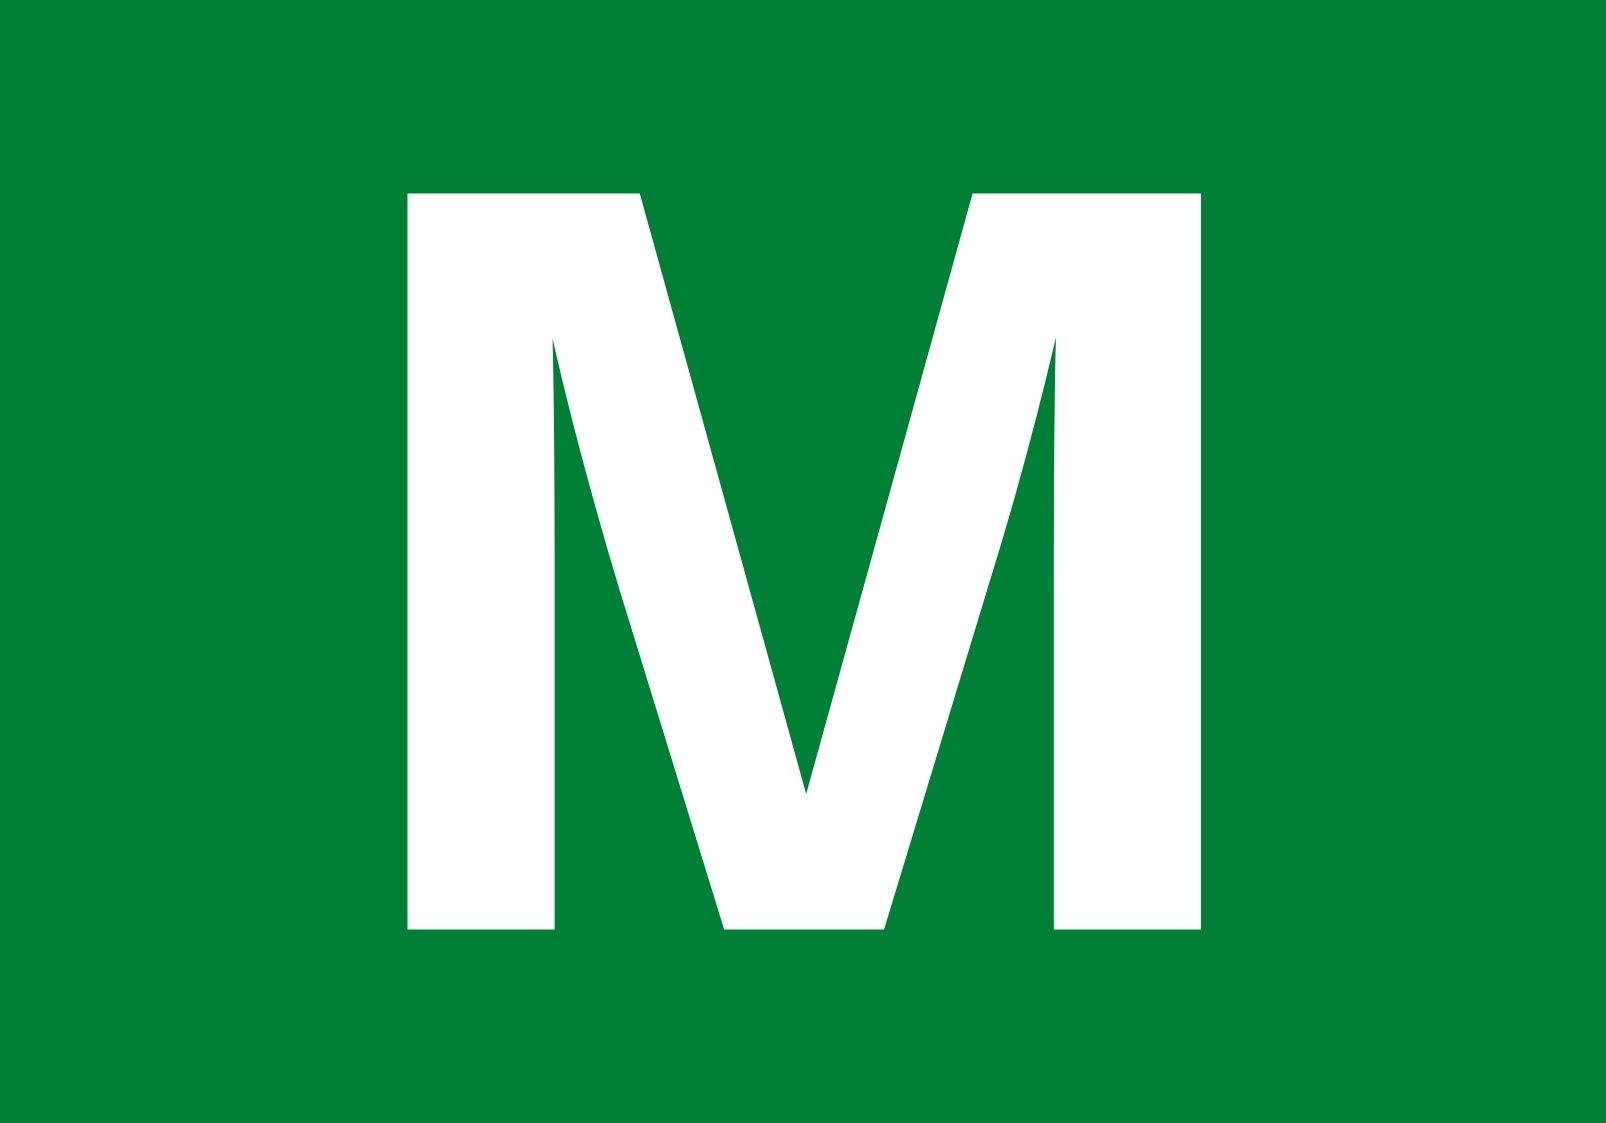 MUZEÁLIS KÖNYVTÁRI DOKUMENTUMOK NYILVÁNTARTÁSA (BIBLIOTHECA VETUS HUNGARIAE)